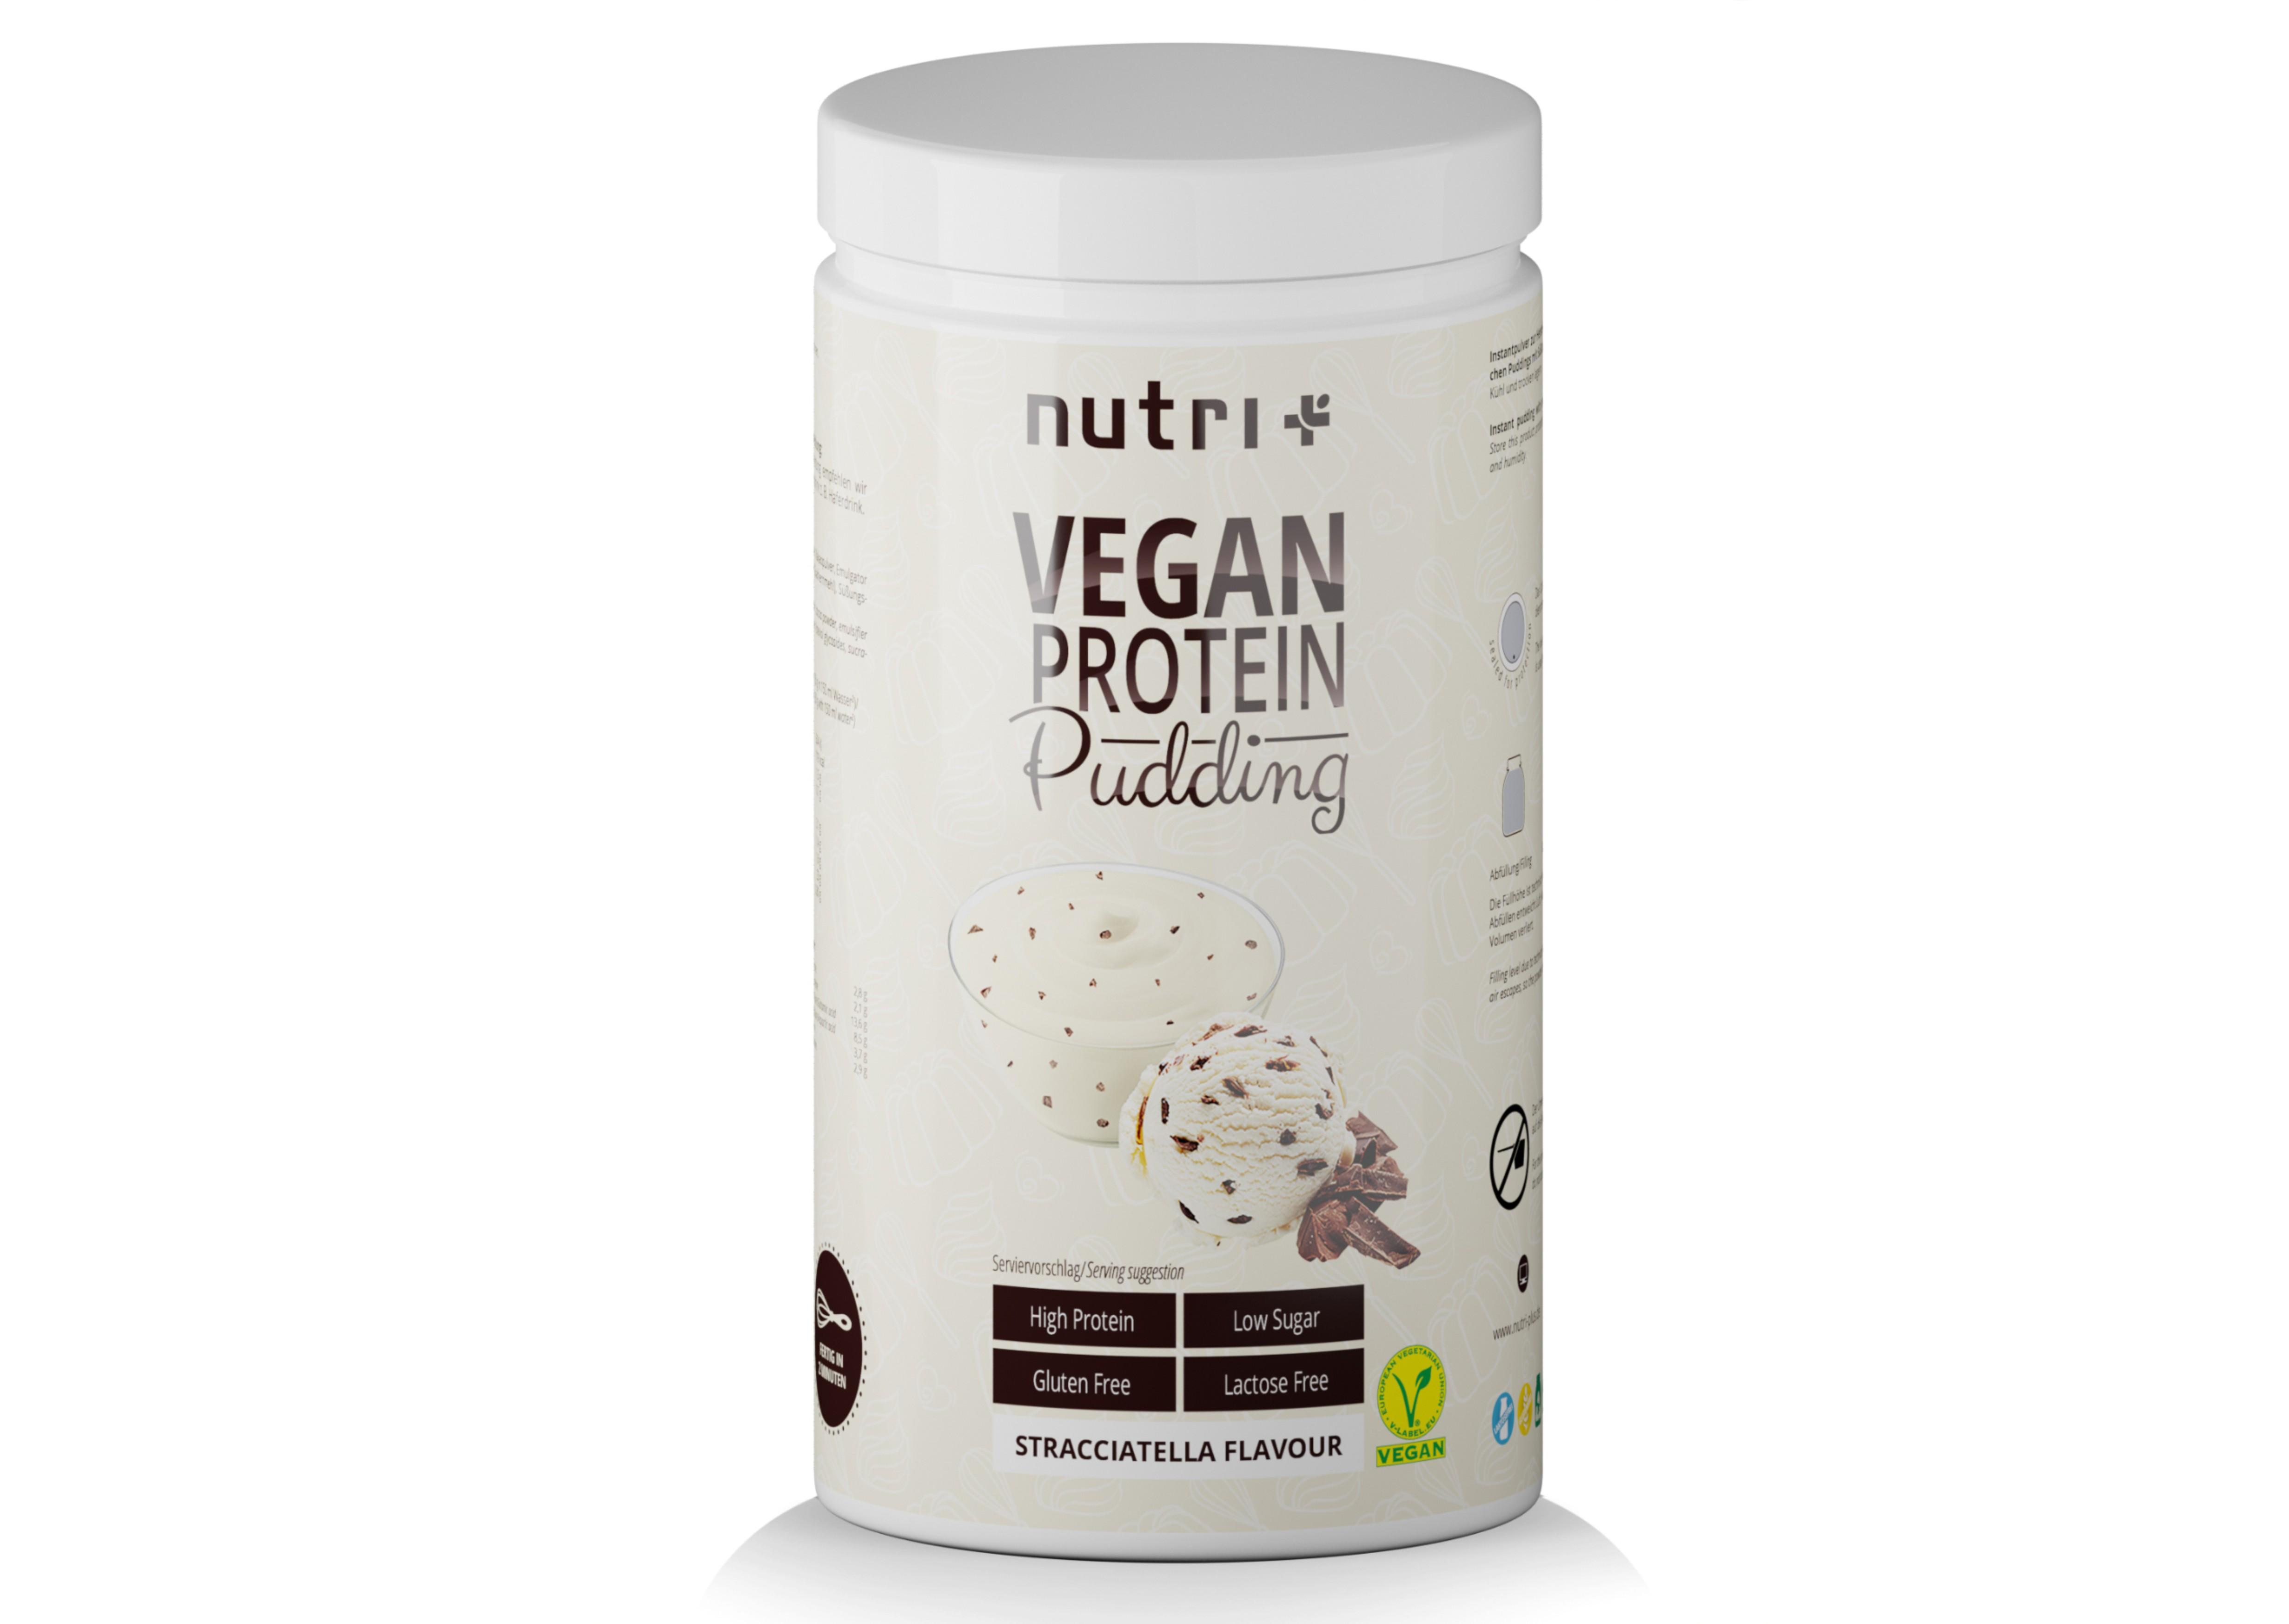 nutri+ Protein-Pudding Vegan - ohne Laktose